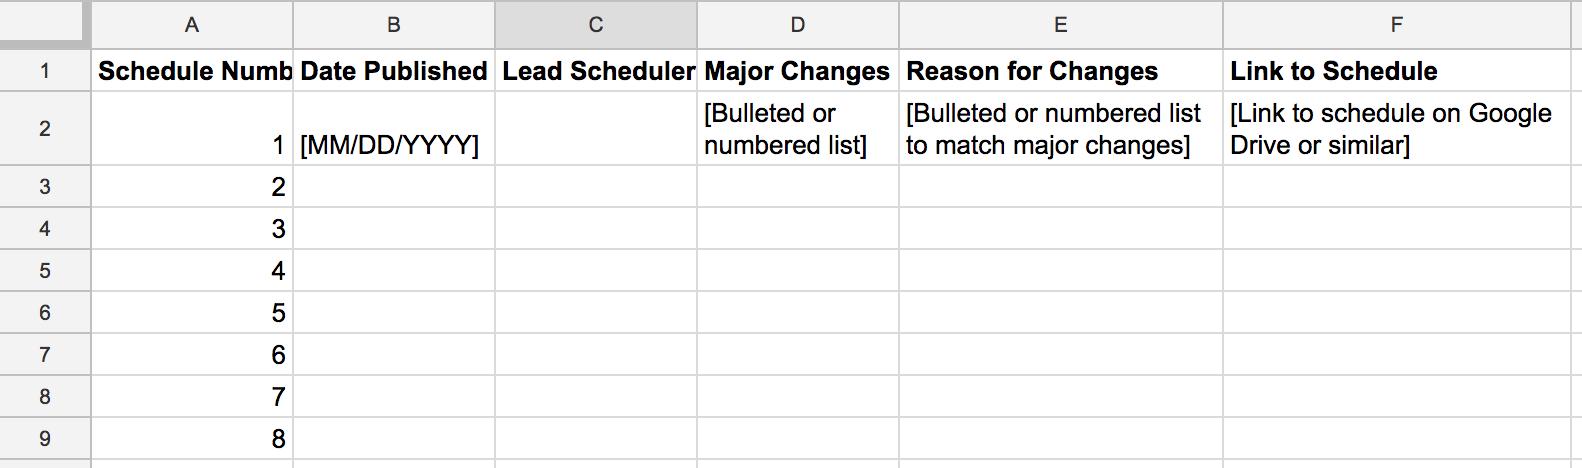 schedule-tracking-spreadsheet-screenshot